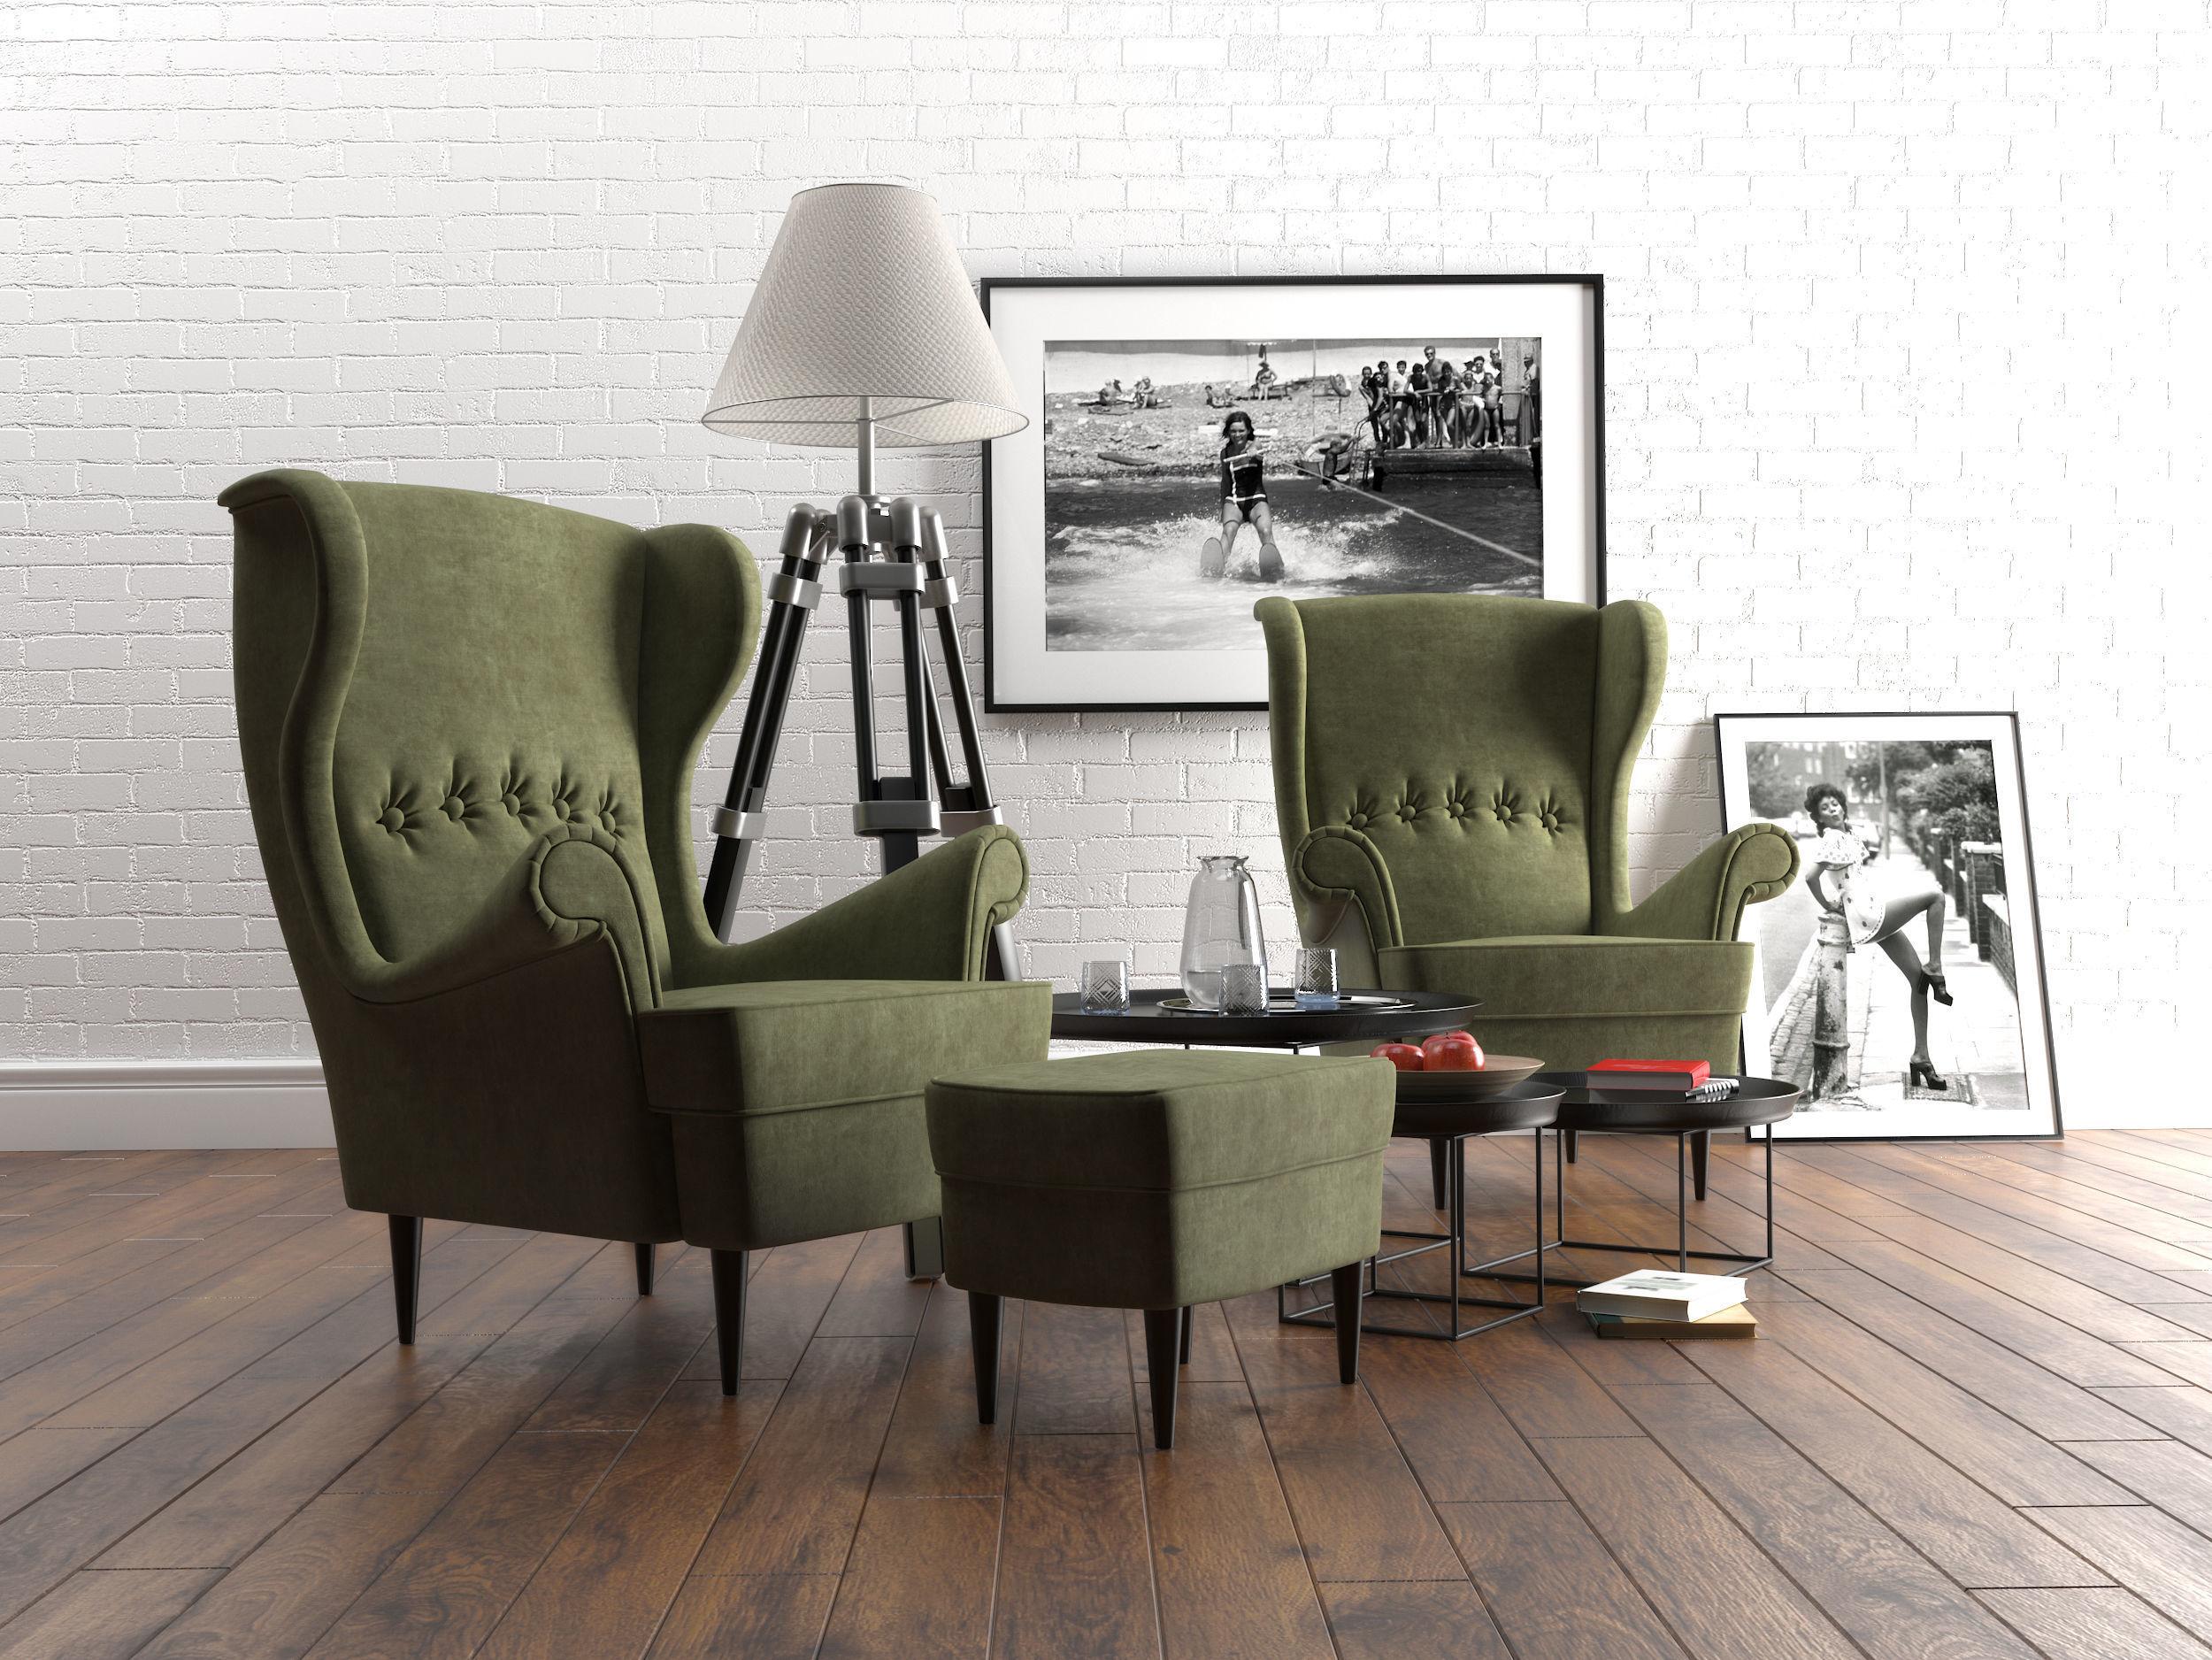 ikea strandmon armchair set 3d model max obj mtl 3ds fbx mat